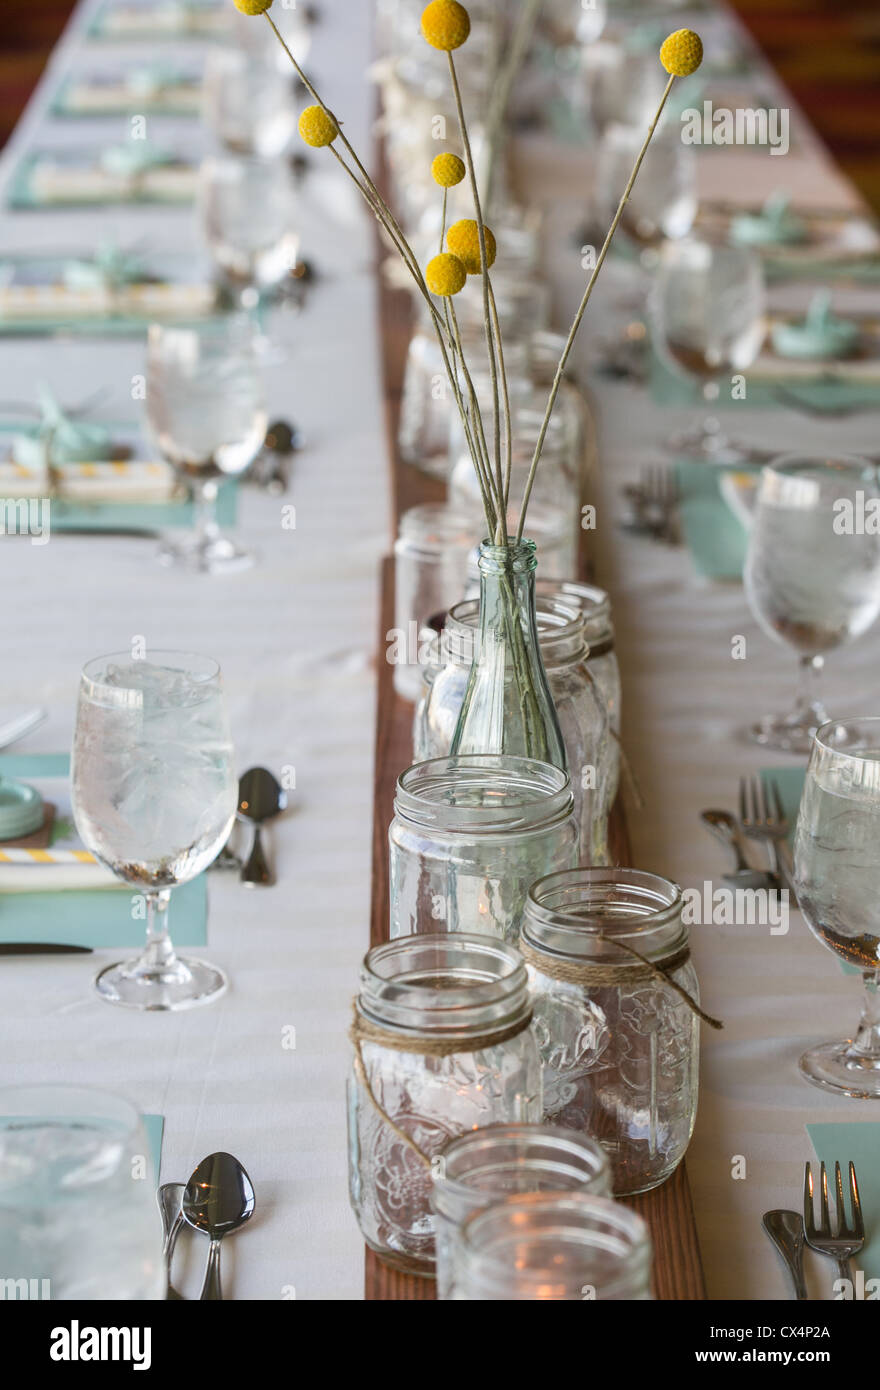 Rustic table setting for a wedding featuring mason jars glass bottles holding Craspedia (Billyu0027s Balls) flowers & Rustic table setting for a wedding featuring mason jars glass ...